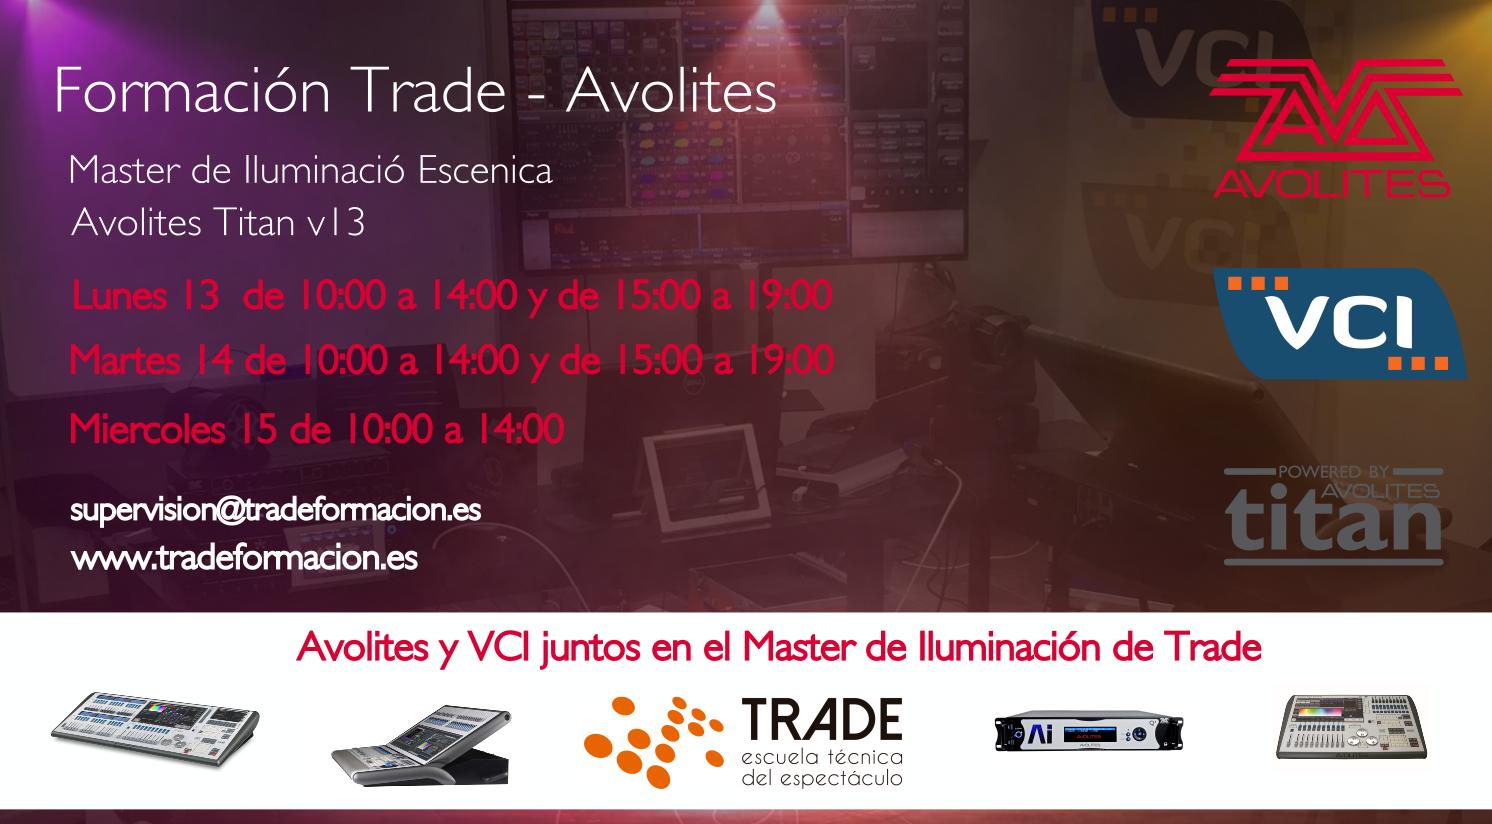 Formación Trade - Avolites